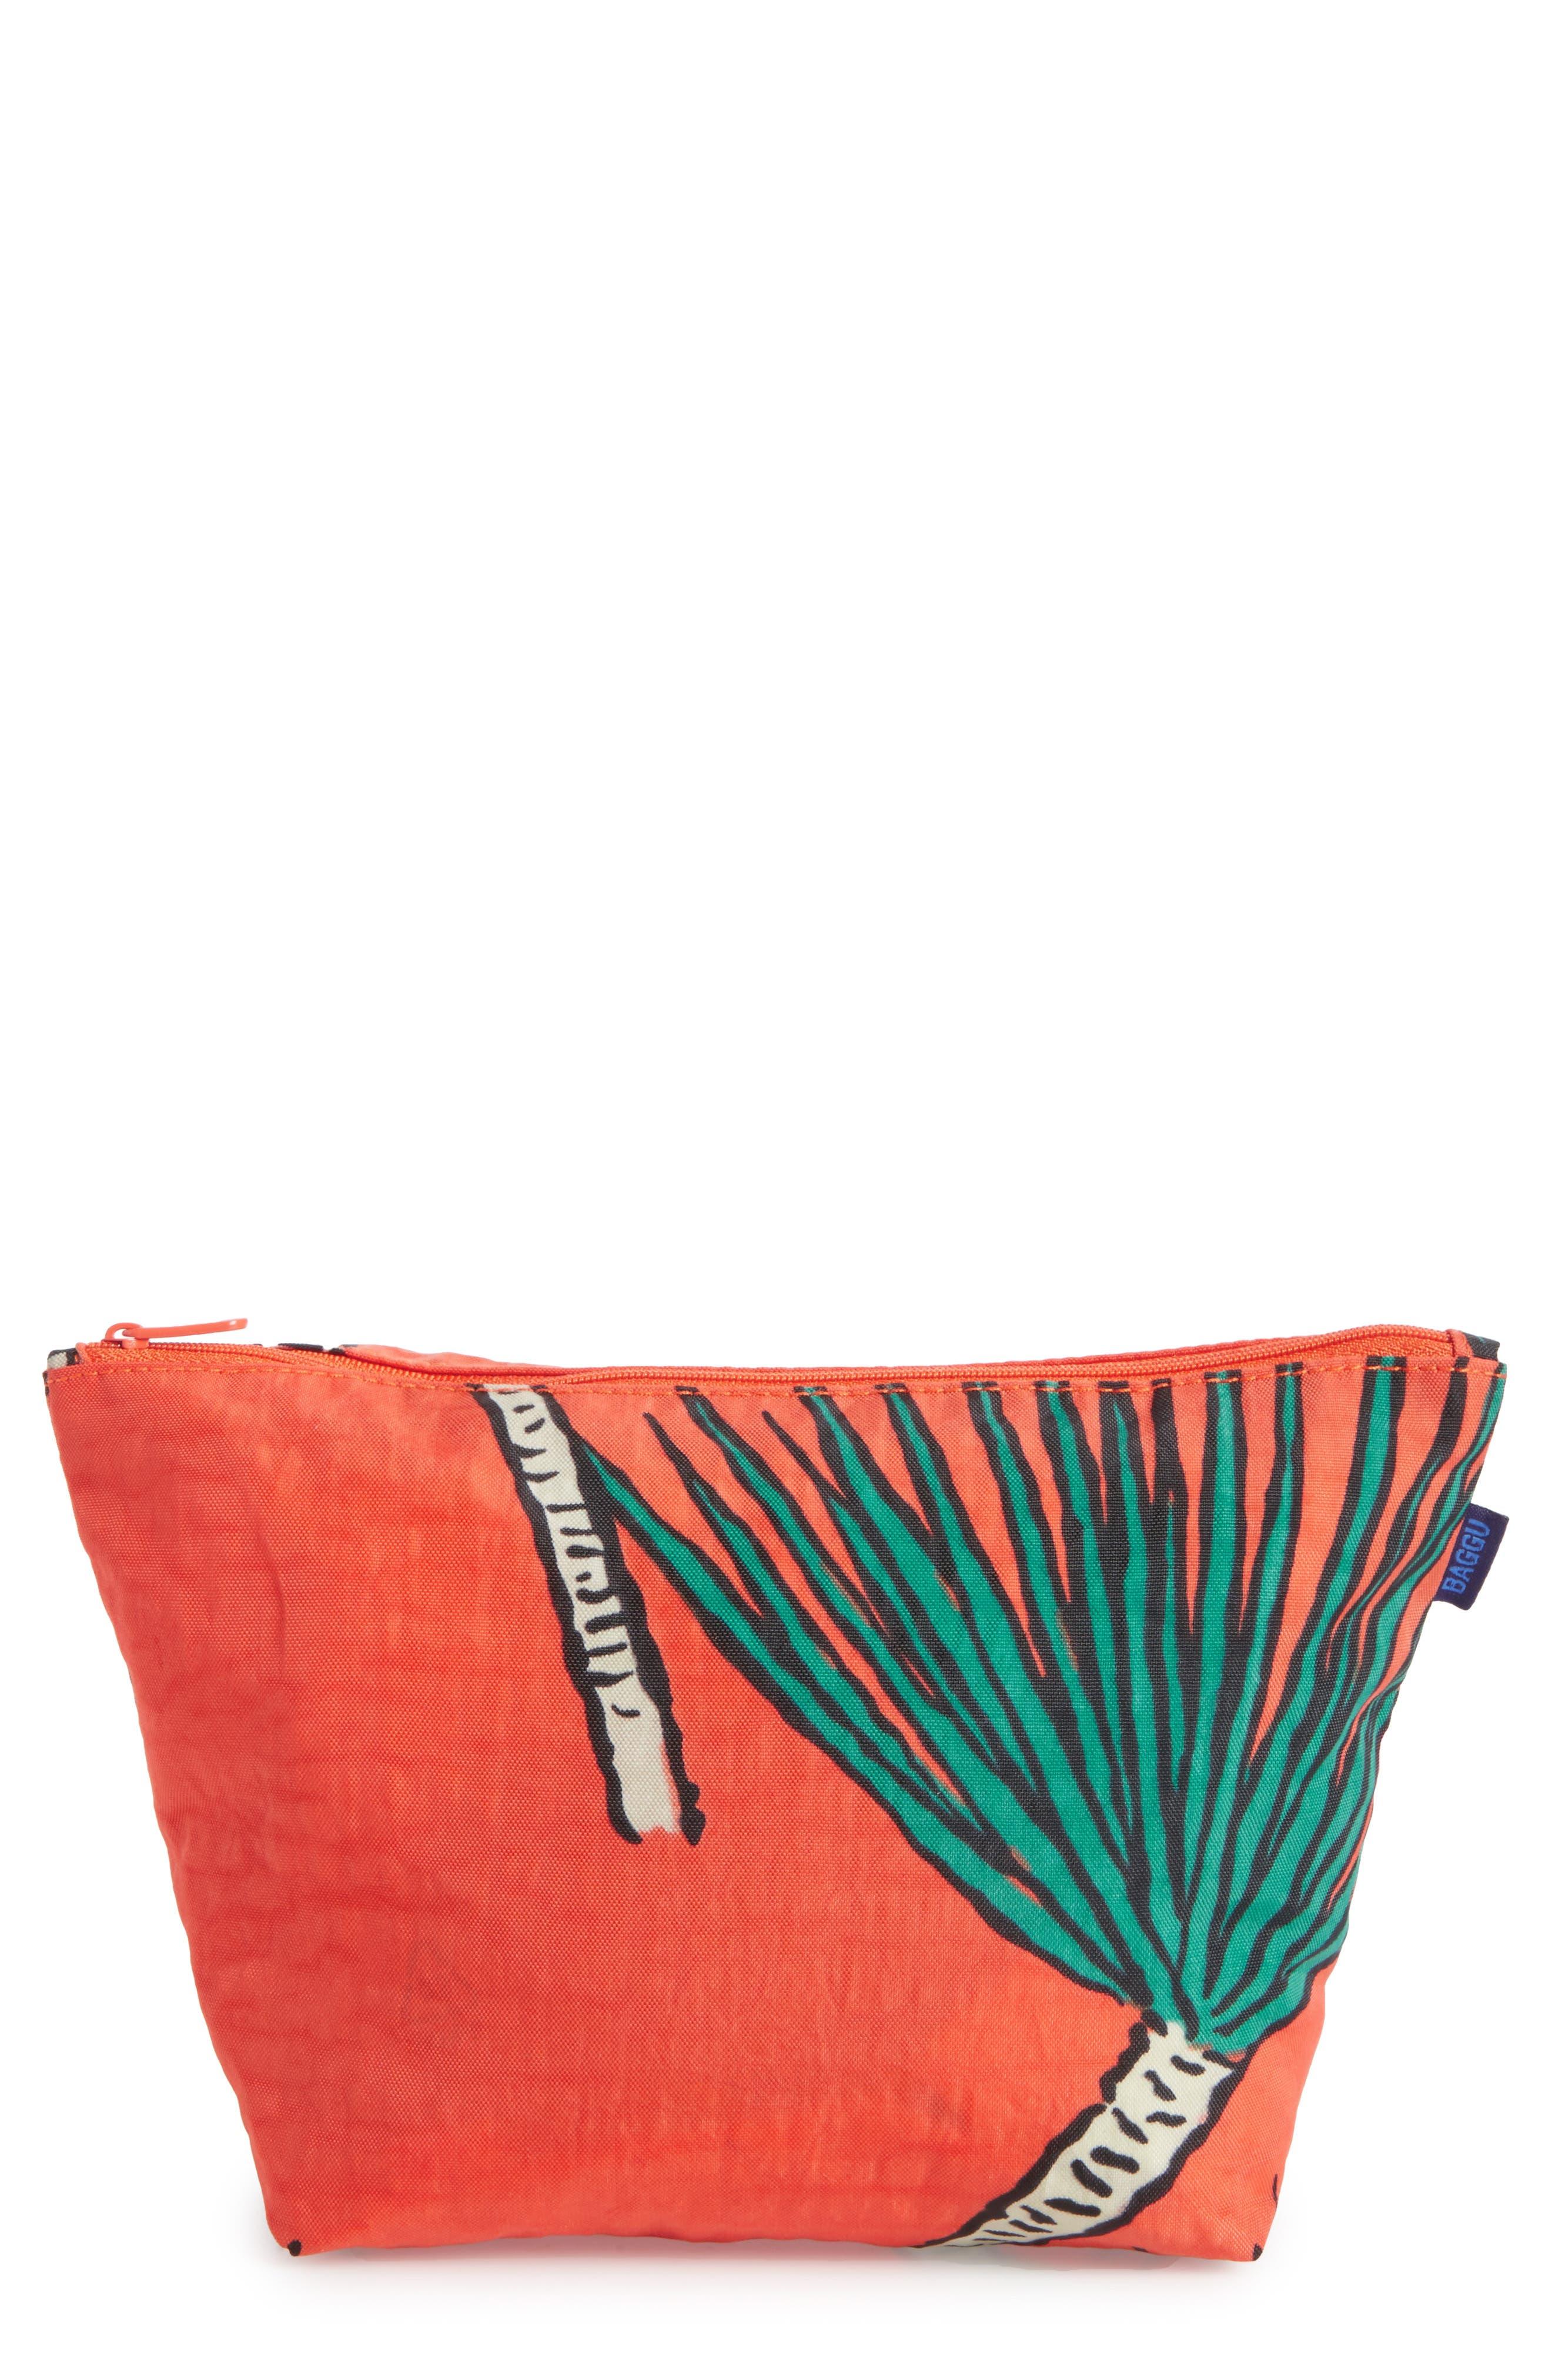 Medium Carry All Nylon Pouch,                         Main,                         color, Dragon Tree